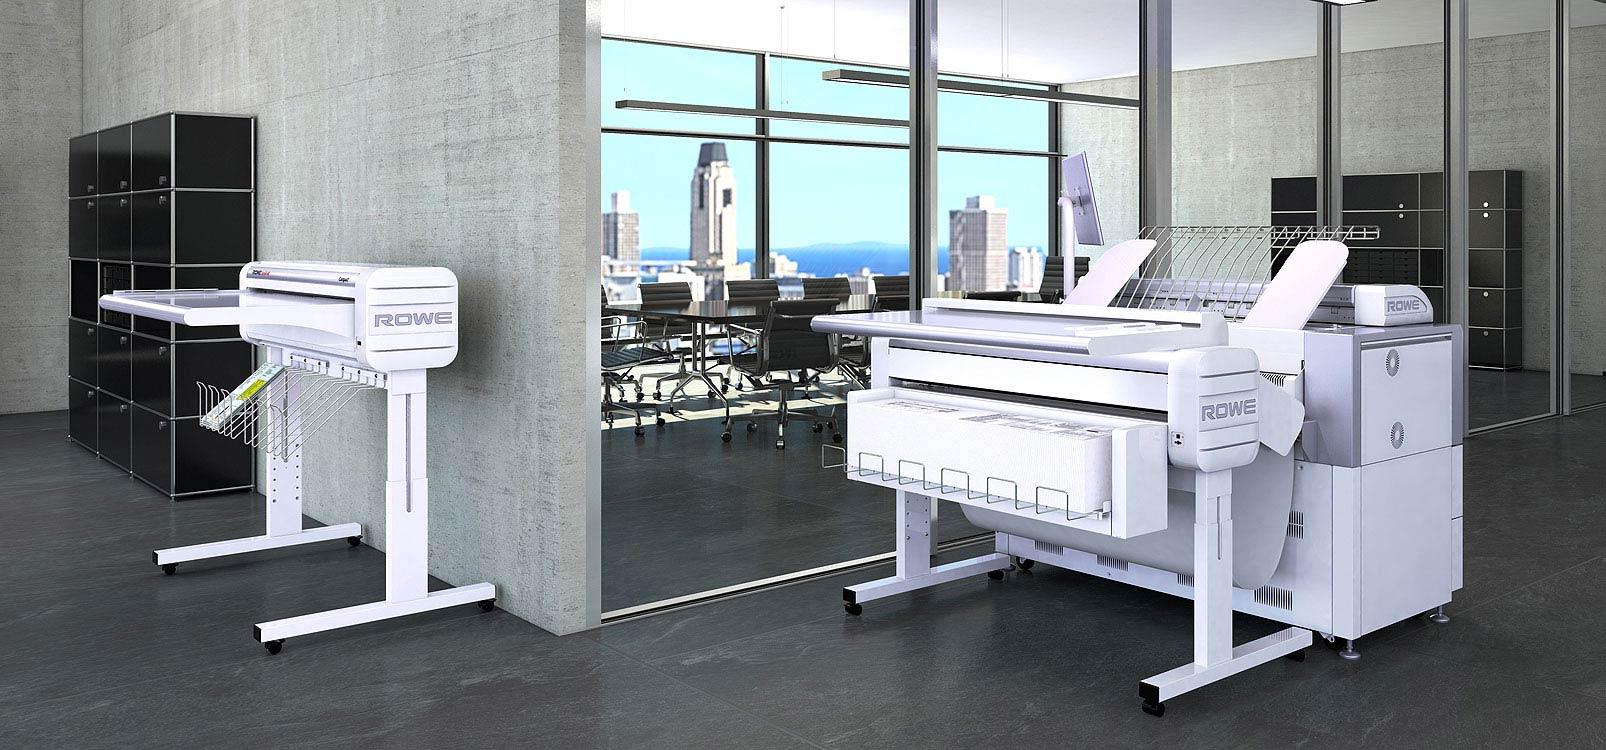 rowe-editorial-variofold_compact_offline_online ROWE VarioFold Compact |大幅面彩色打印机|扫描仪|蓝图机|工程机|叠图机|裁切机专家